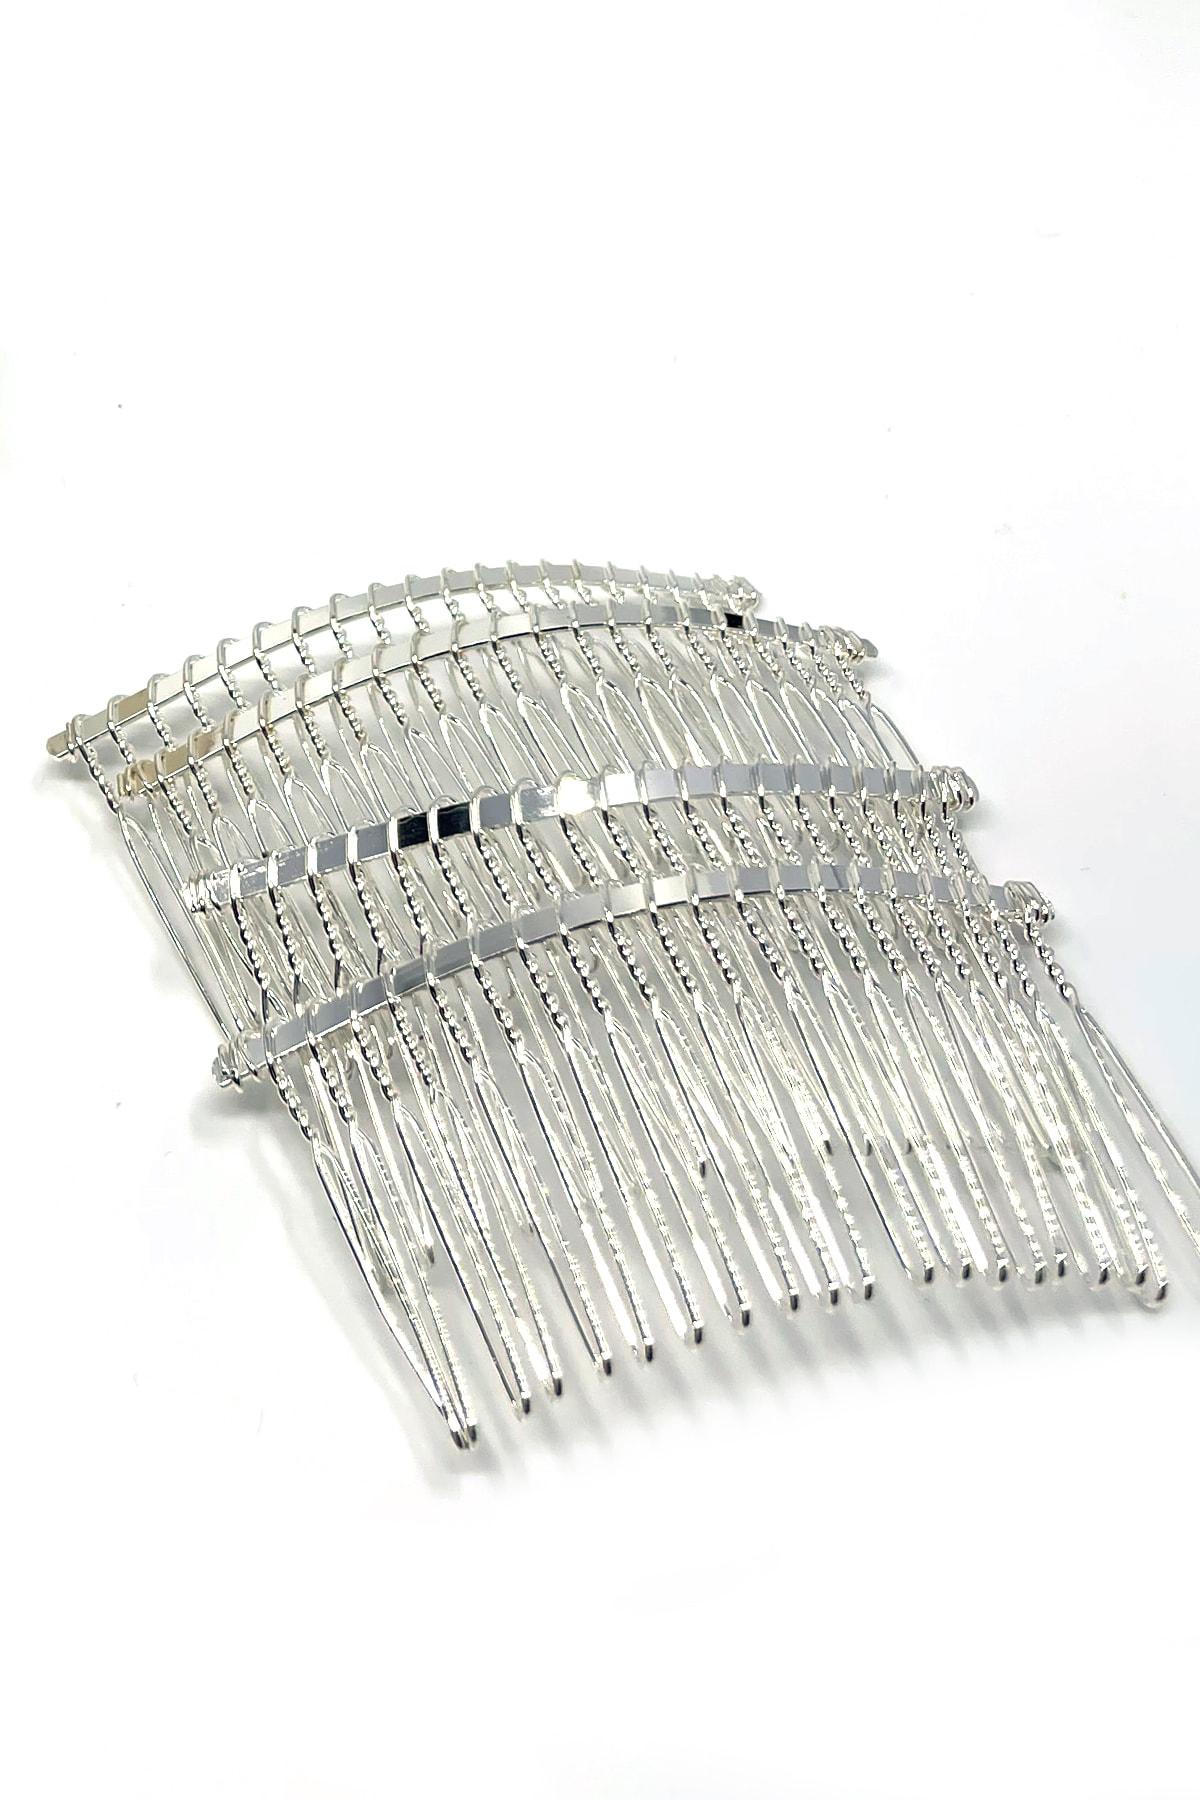 20 Dişli Metal Tarak Toka Gümüş Renk 5 Adet